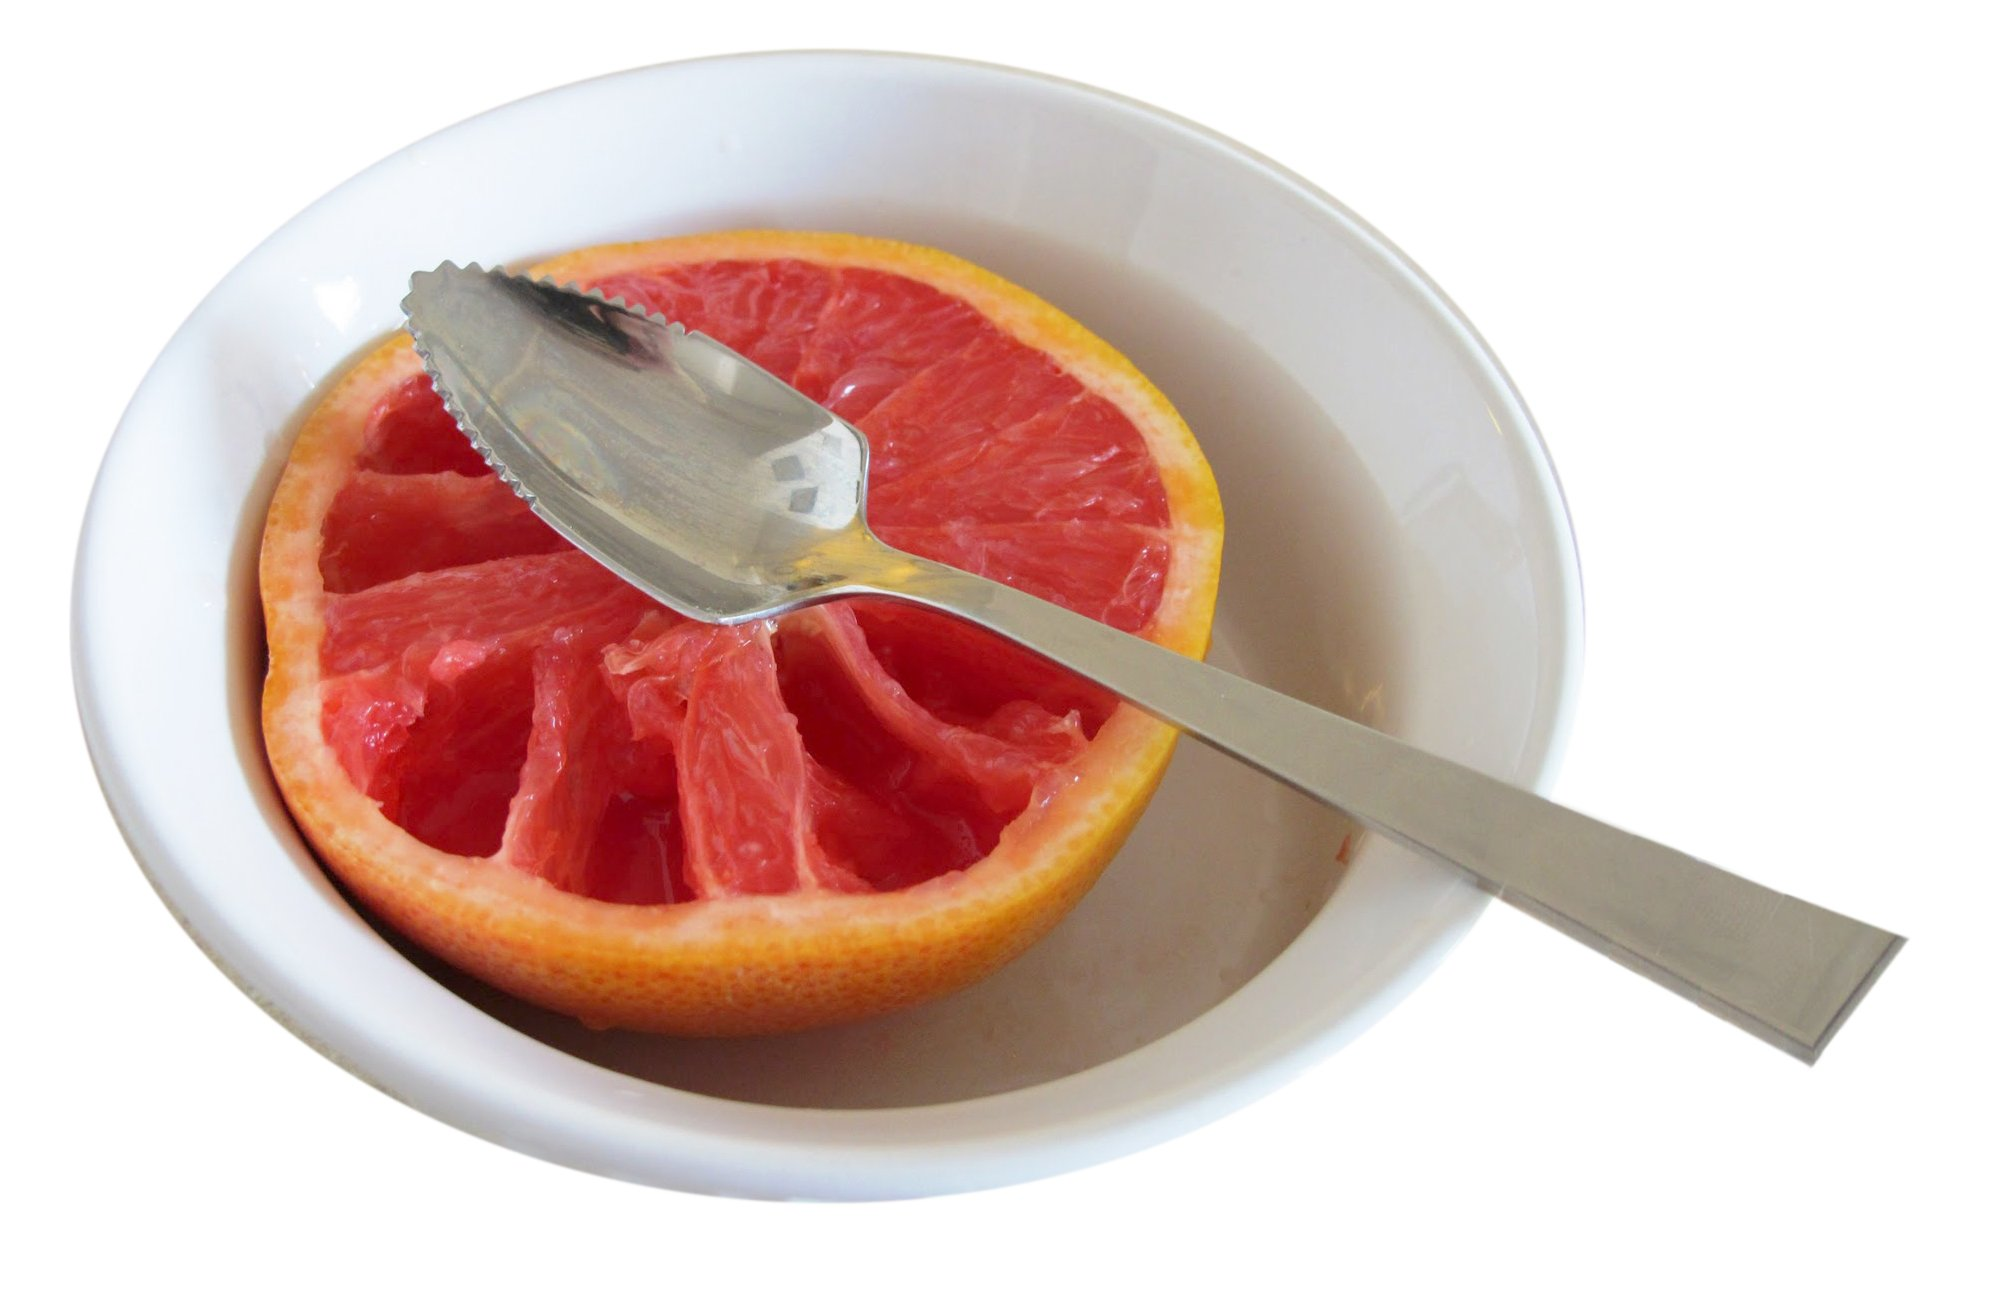 Cuisinox Spo-GR Serrated Grapefruit Spoon, Silver